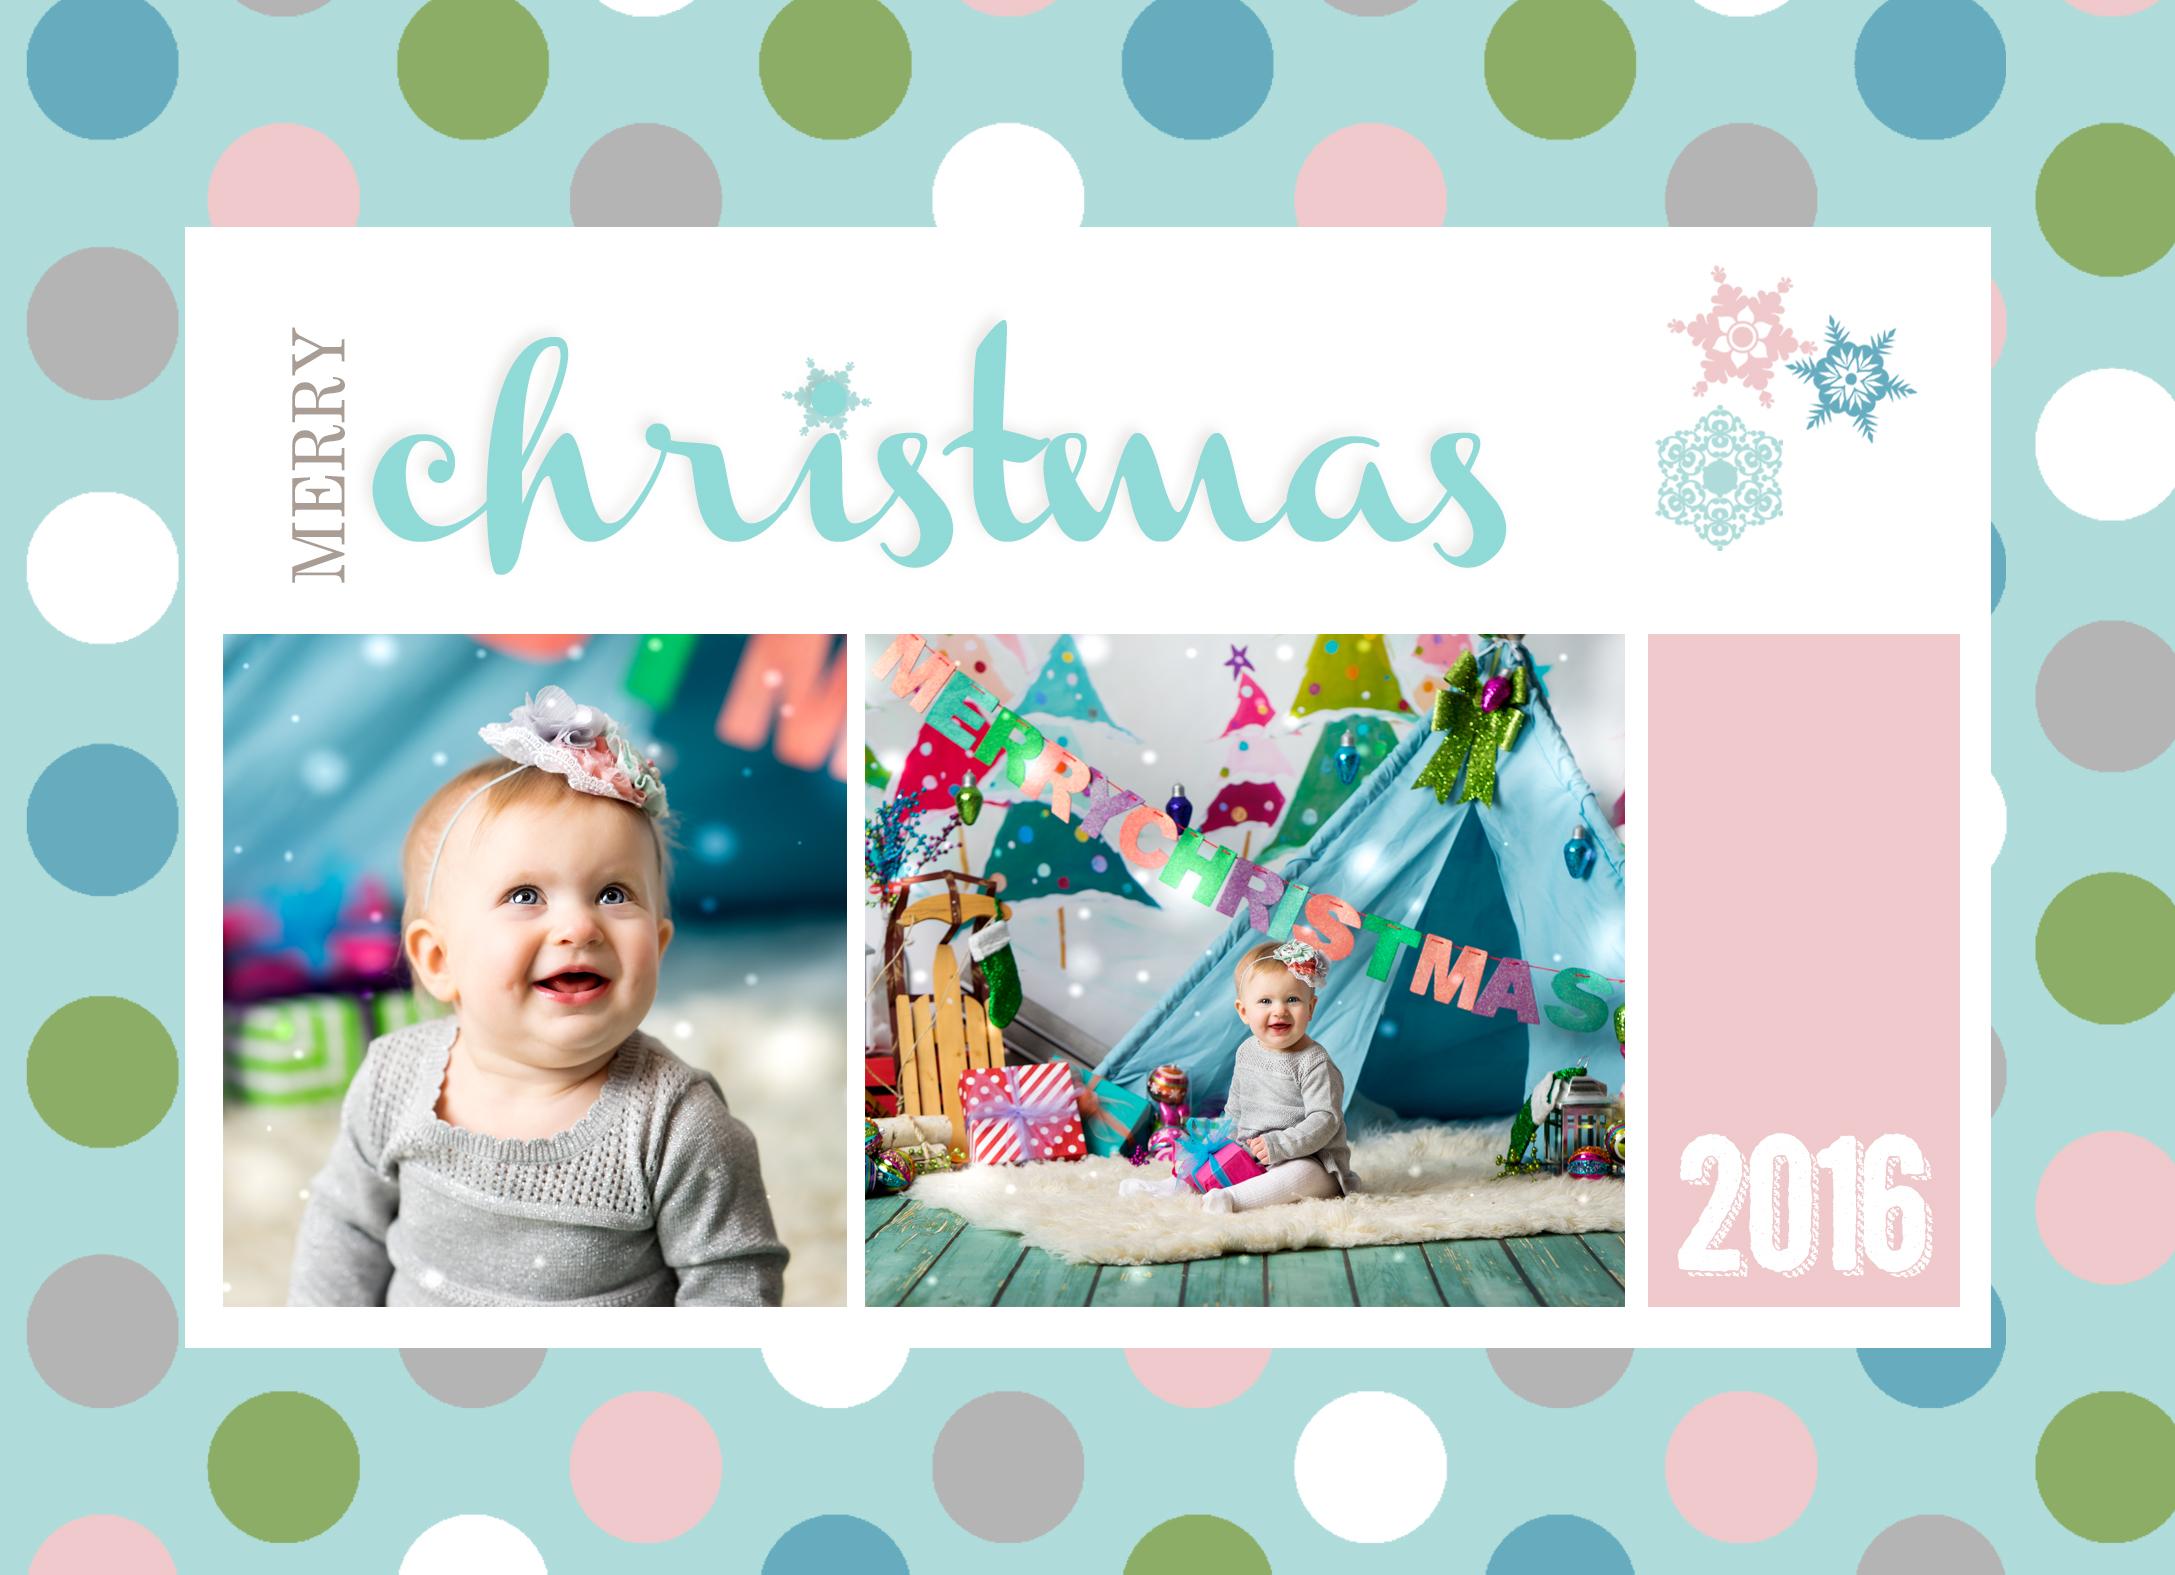 Hannah Christmas Front